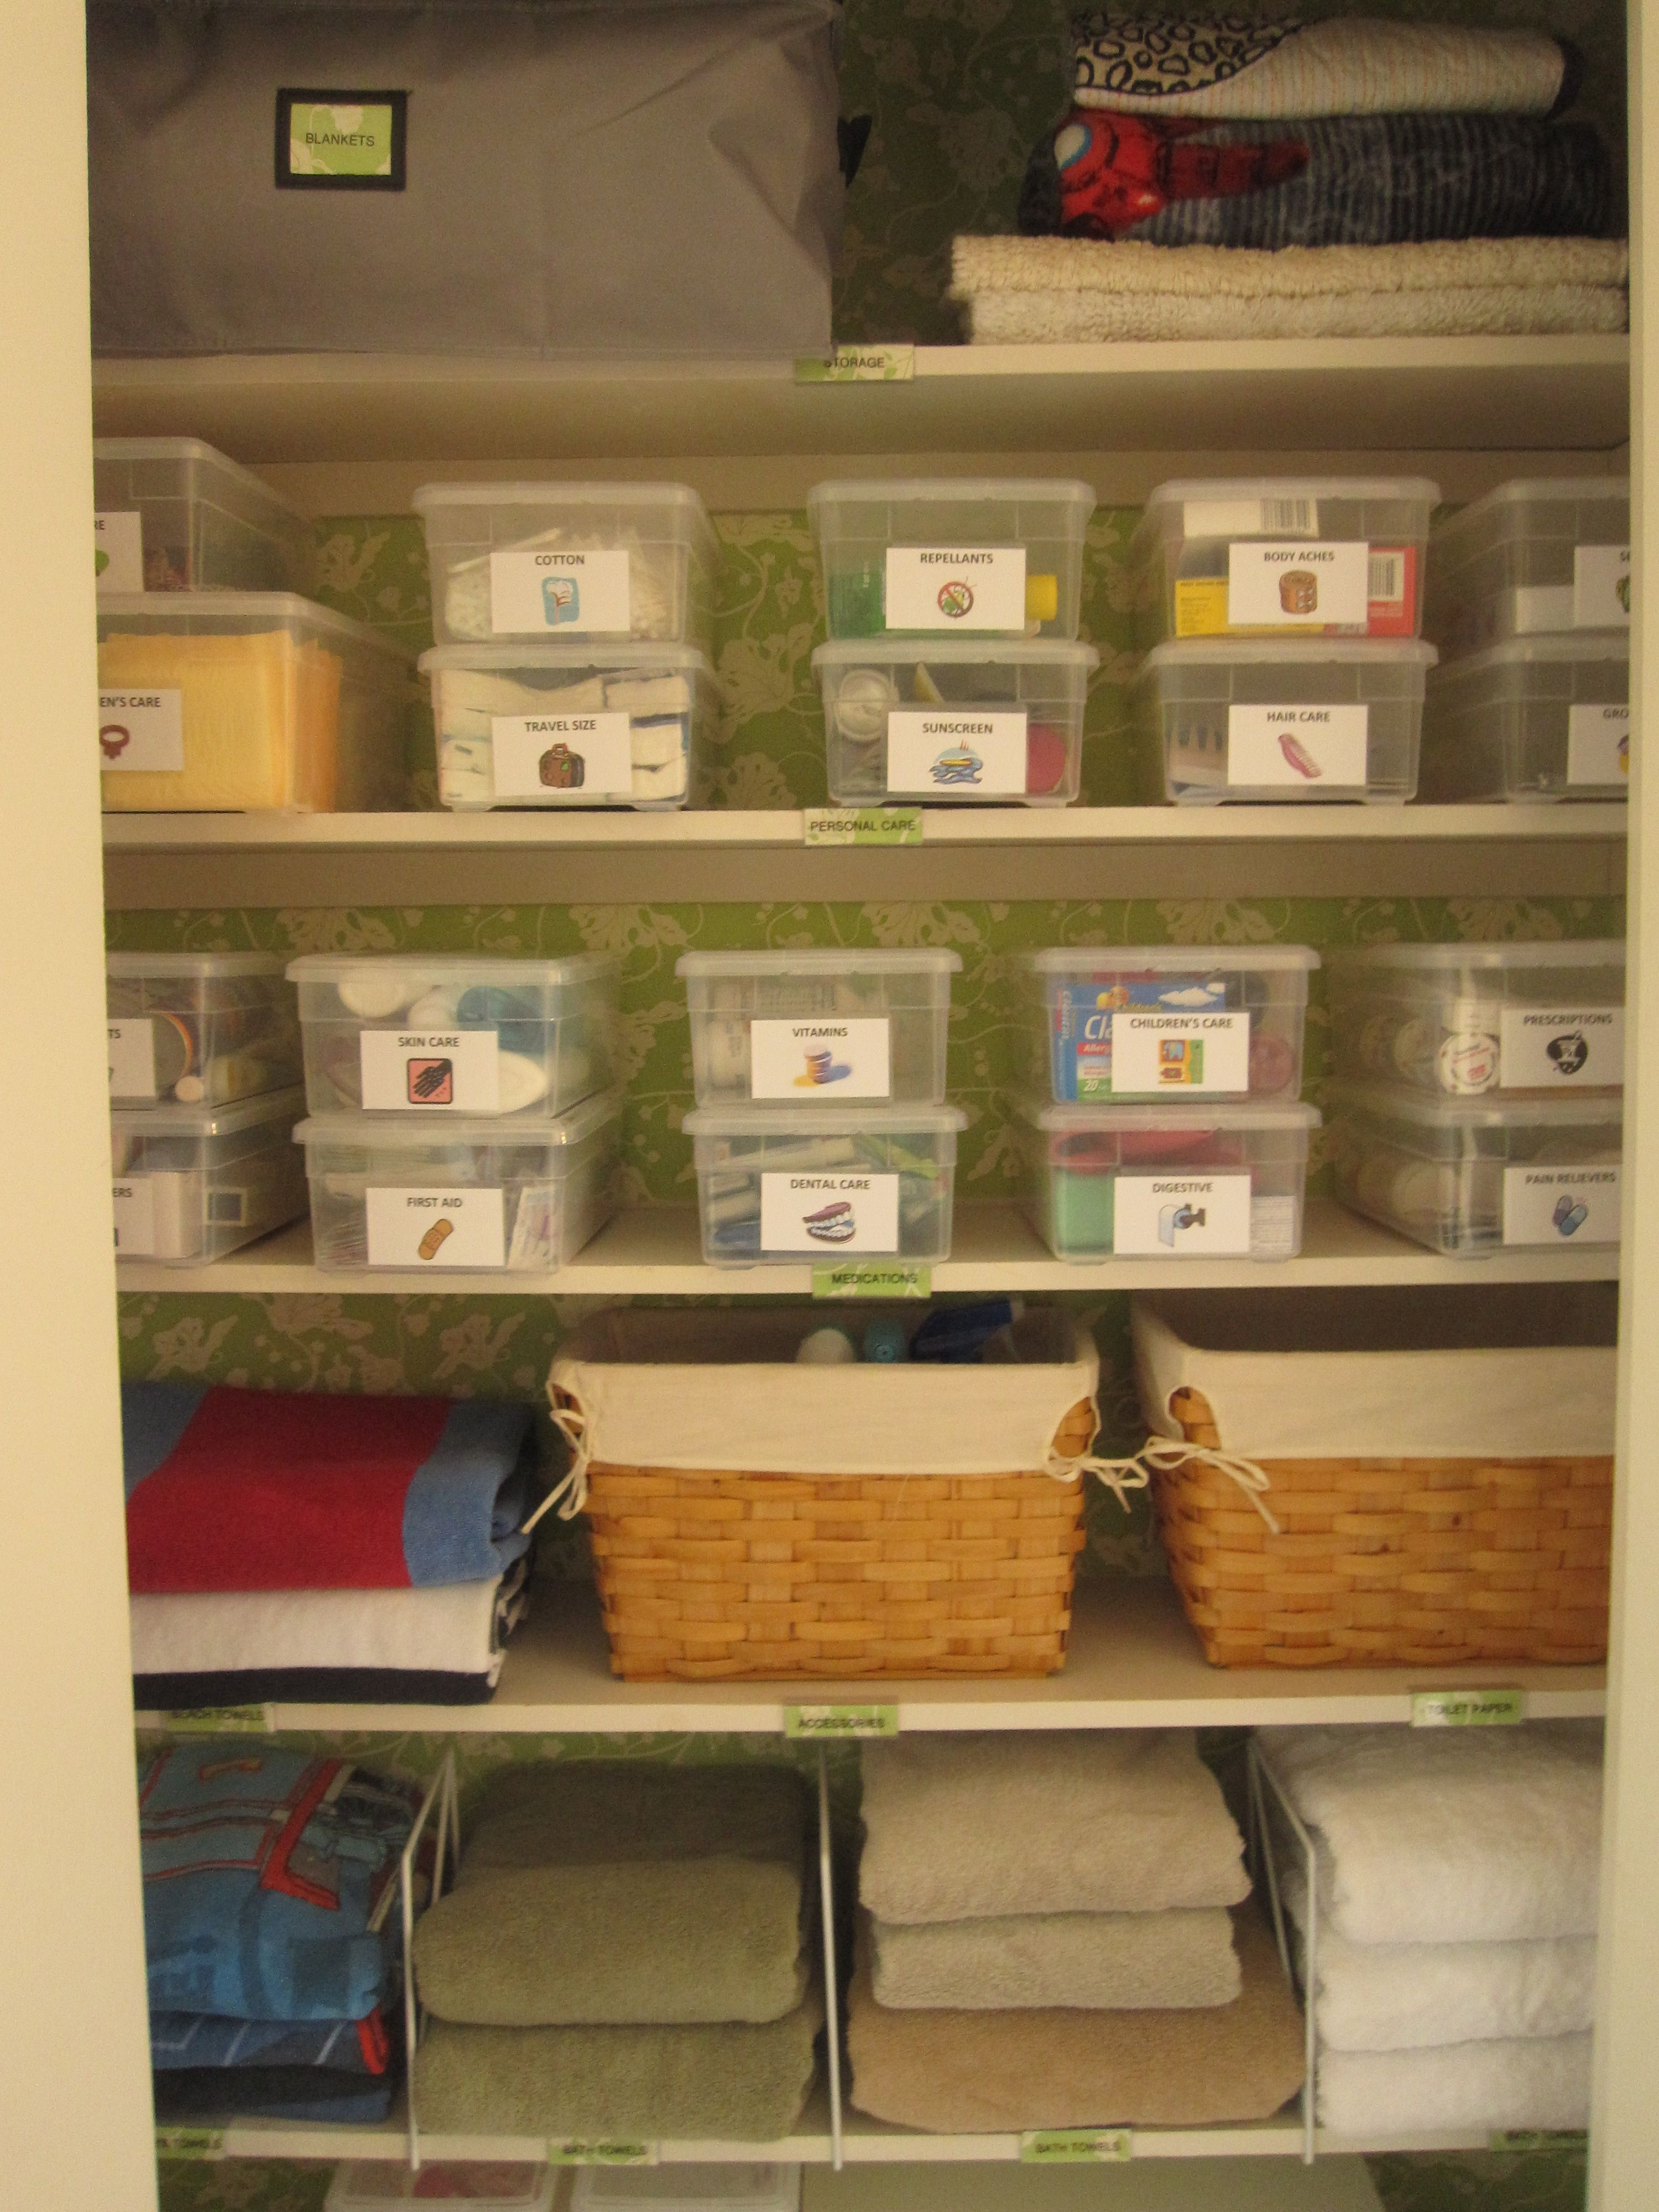 Linen Closet Organization Ideas Pinterest Part - 46: Organizing Linens: Perfectly Organized Linen Closet// I Like The Labeled  Bins, Baskets